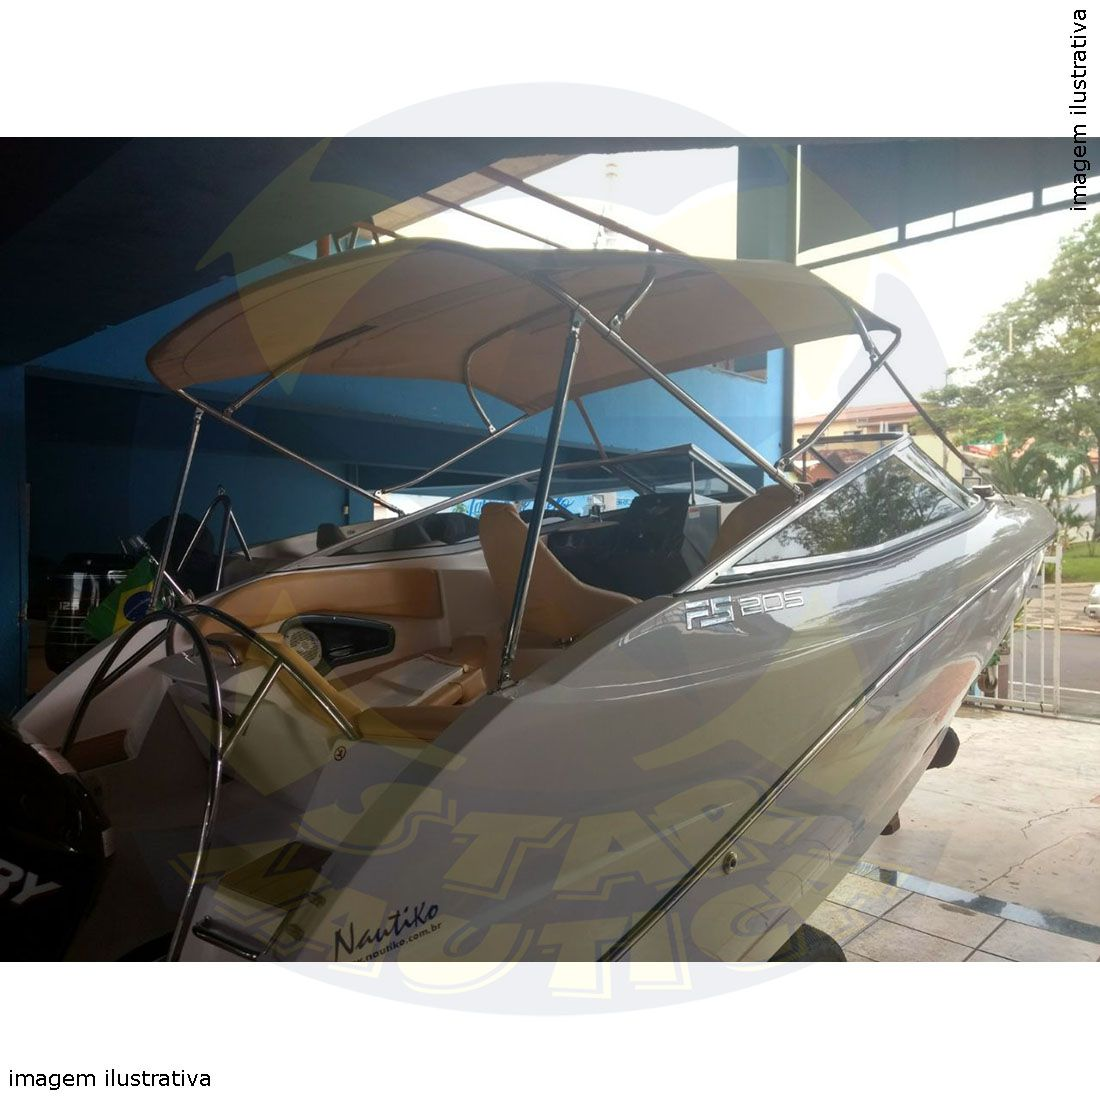 Capota Toldo Lancha Focker 230 Poliéster 4 Arcos Tubo 1 1/4